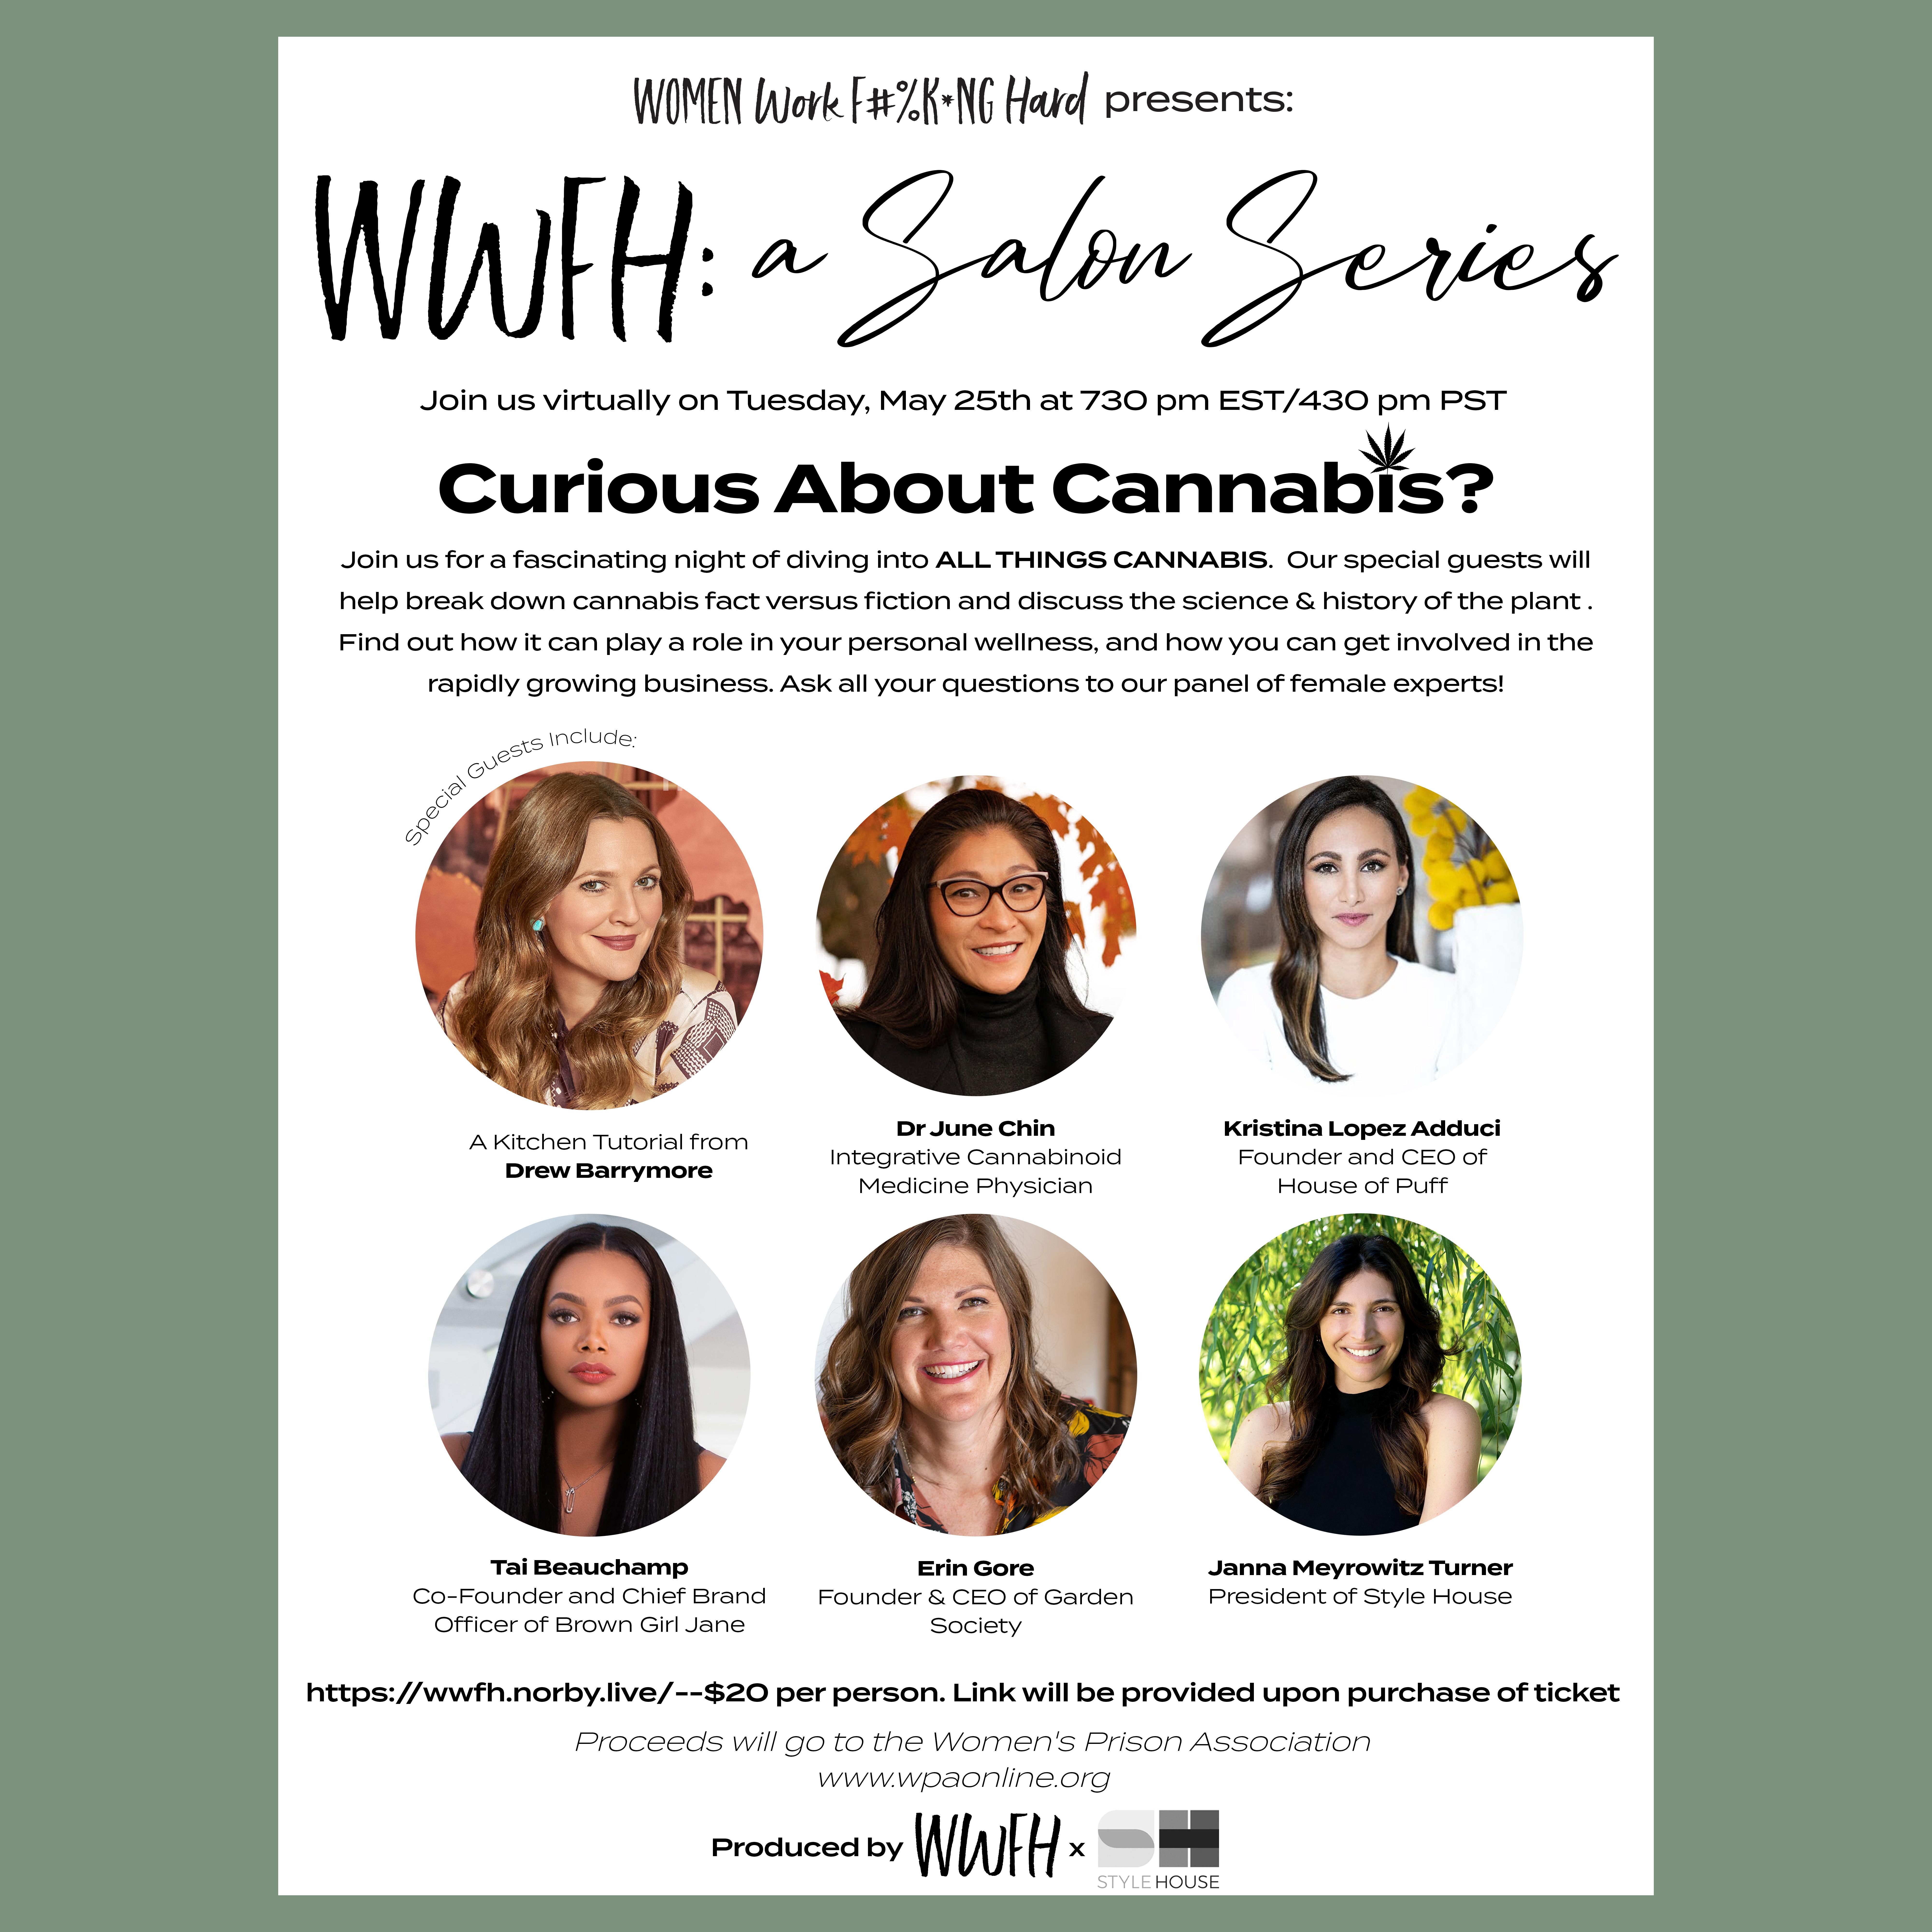 WWFH: A Salon Series--Curious About Cannabis?